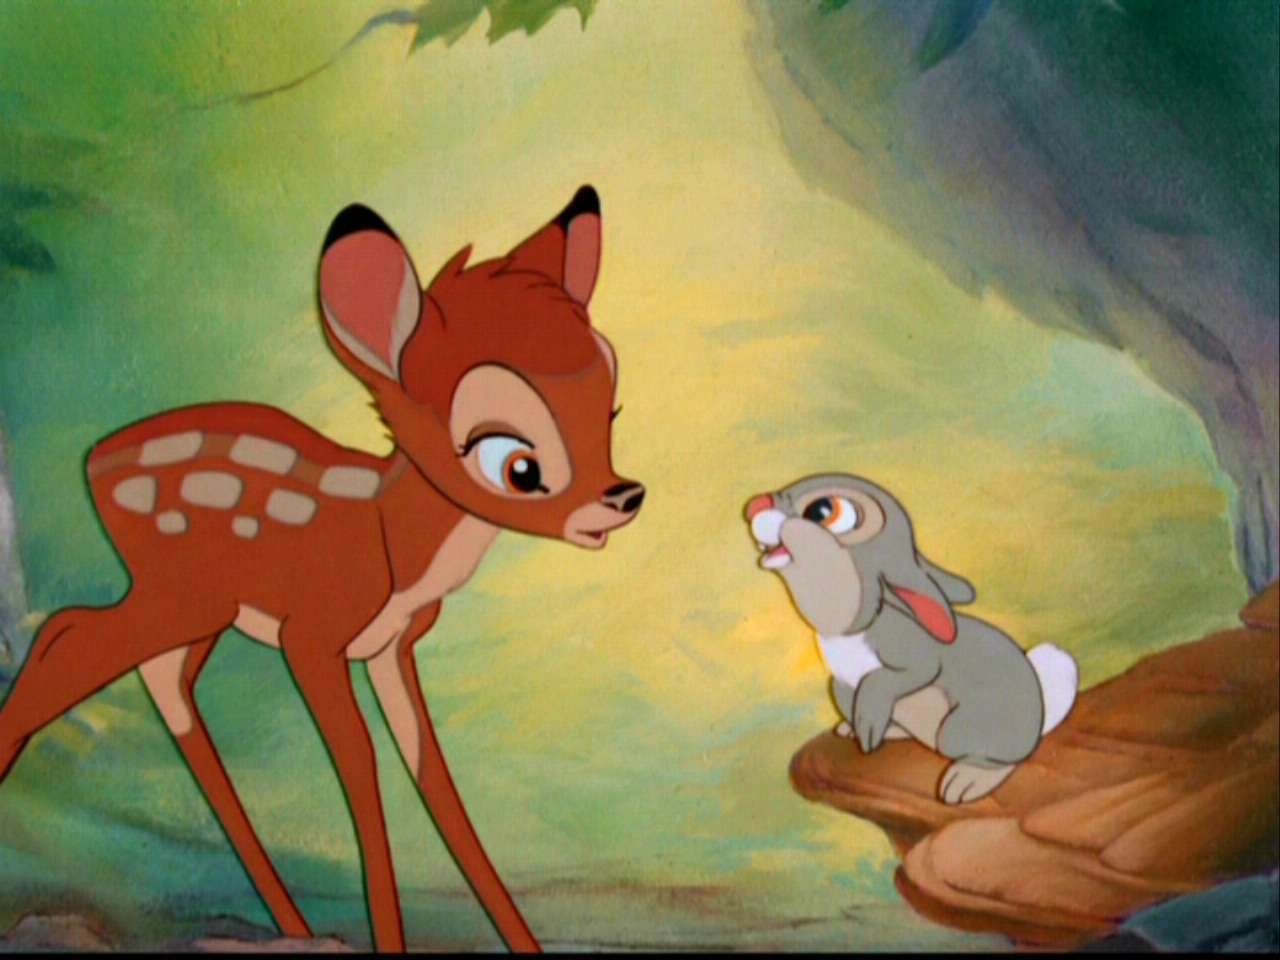 Exclusive-Bambi-HD-Free-Image-Download-wallpaper-wp5805444